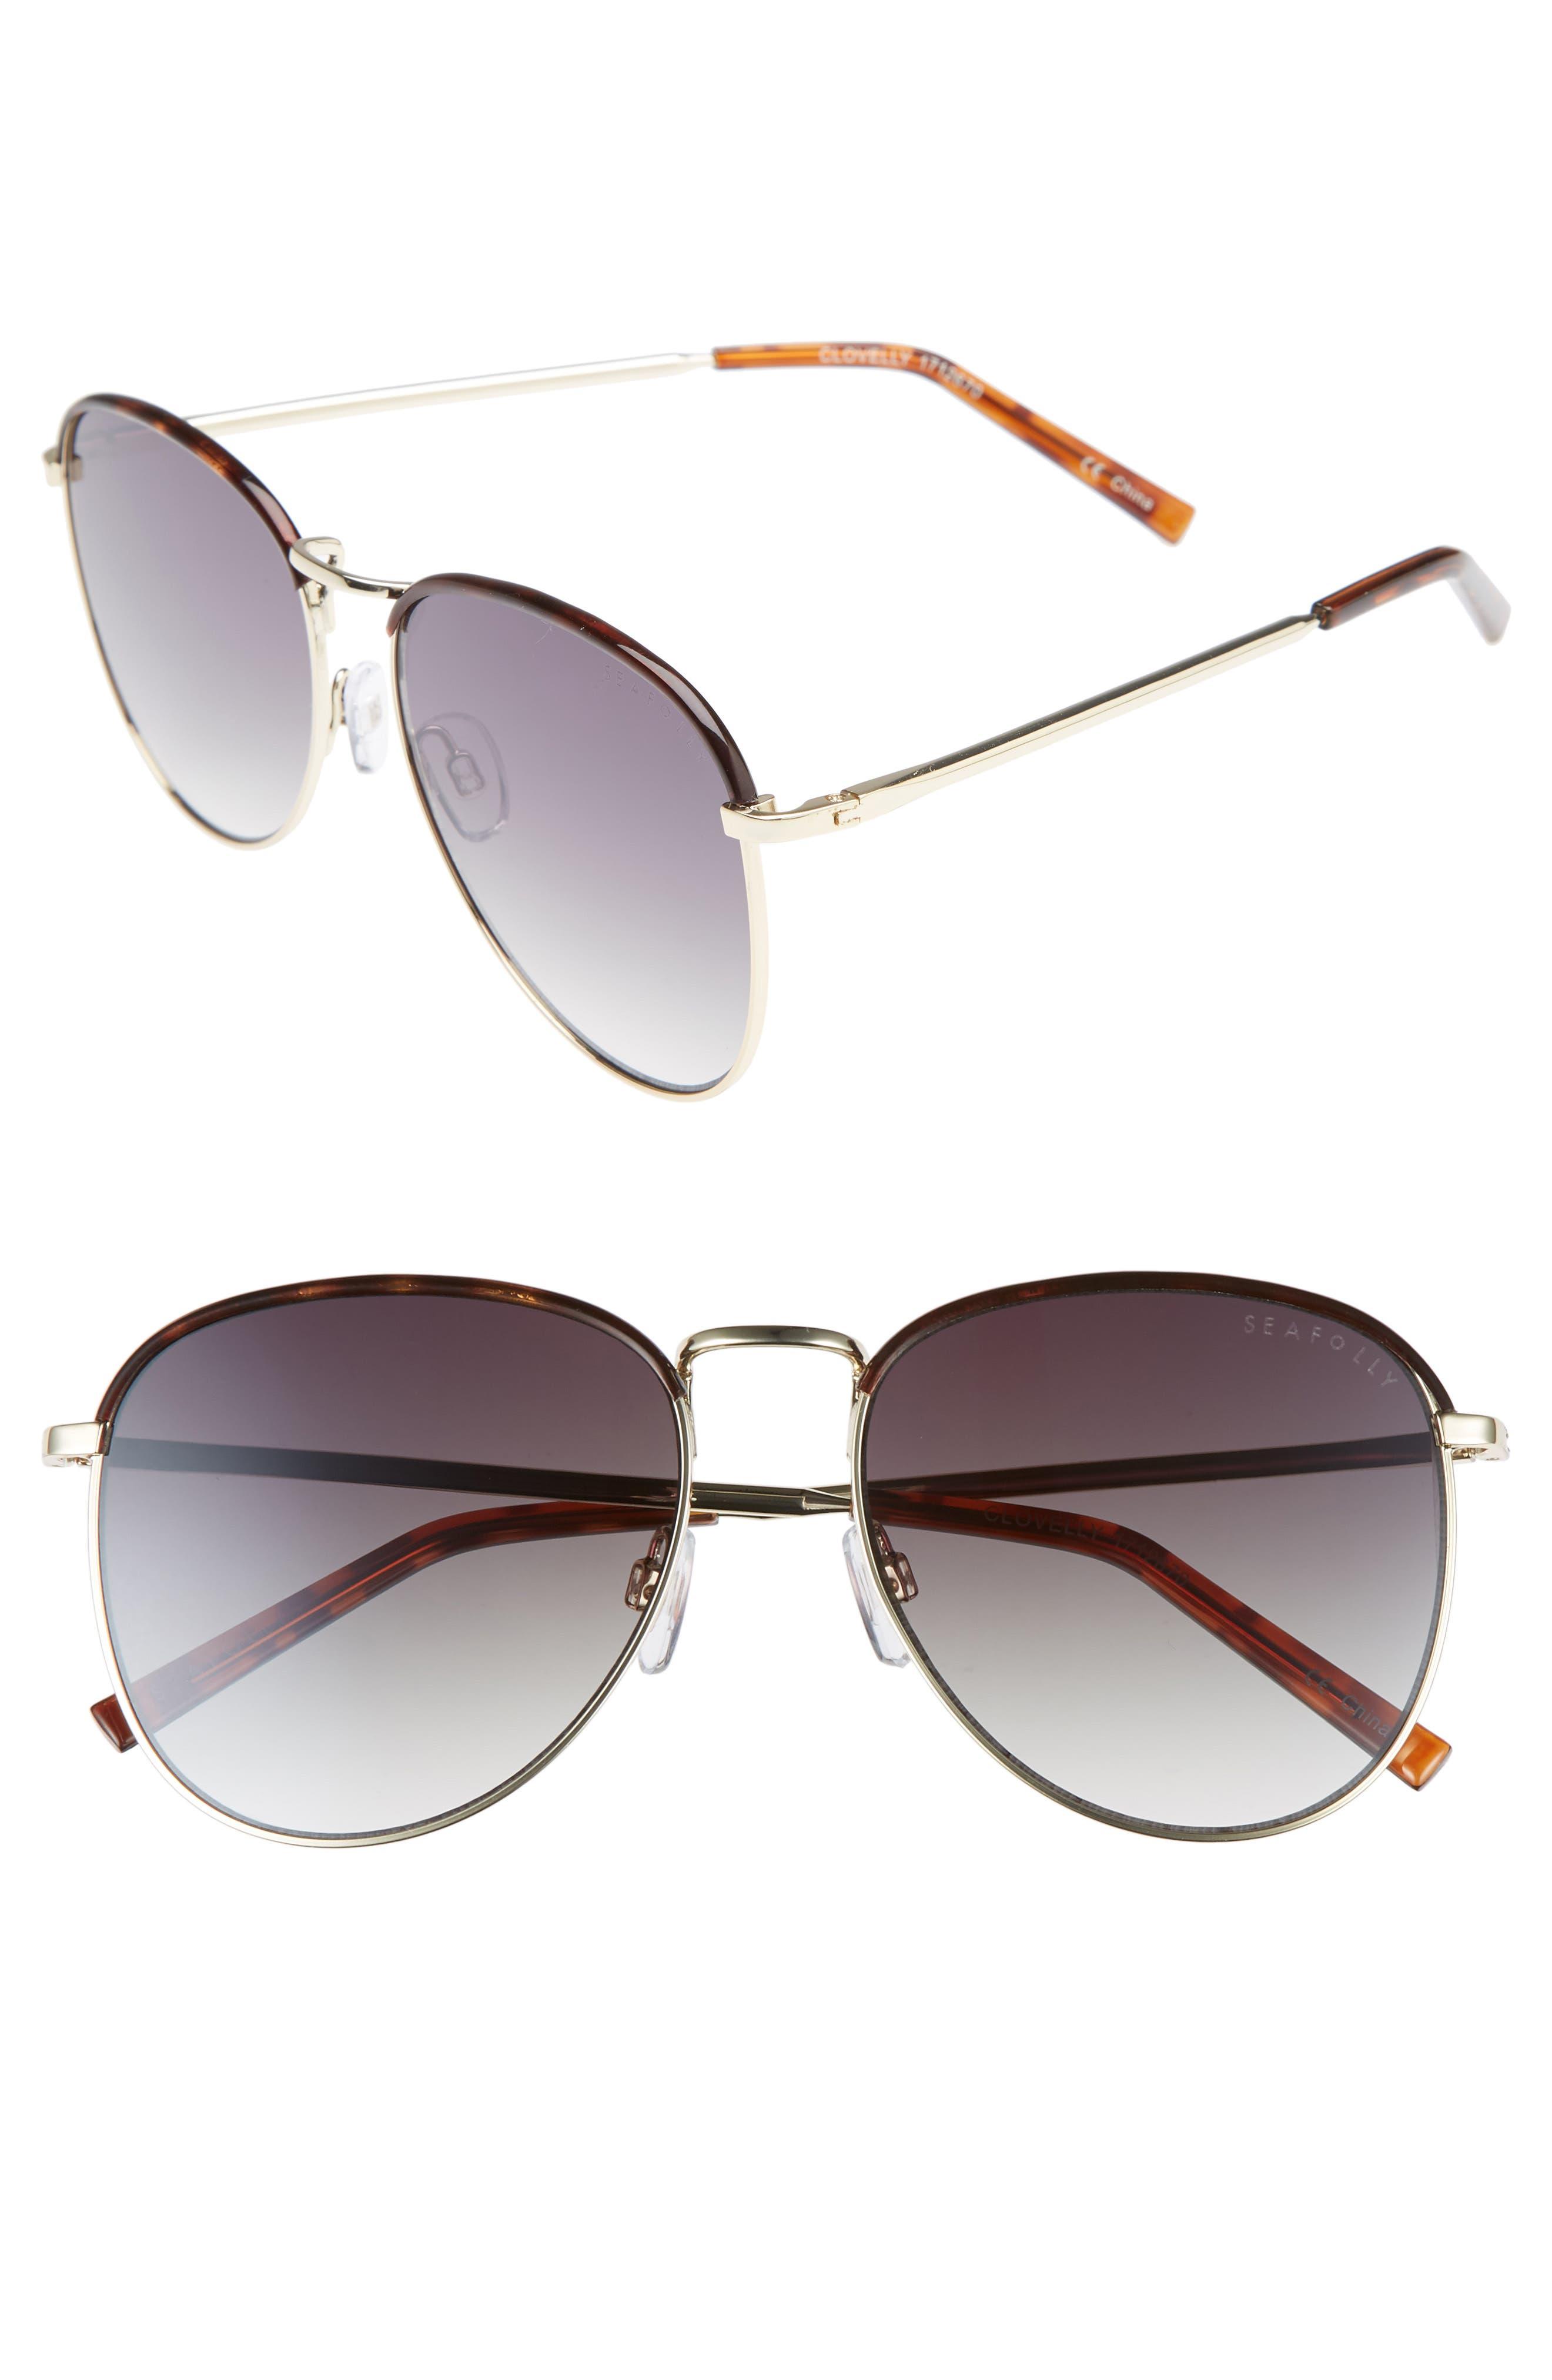 Clovelly 56mm Metal Sunglasses,                             Main thumbnail 1, color,                             DARK TORT